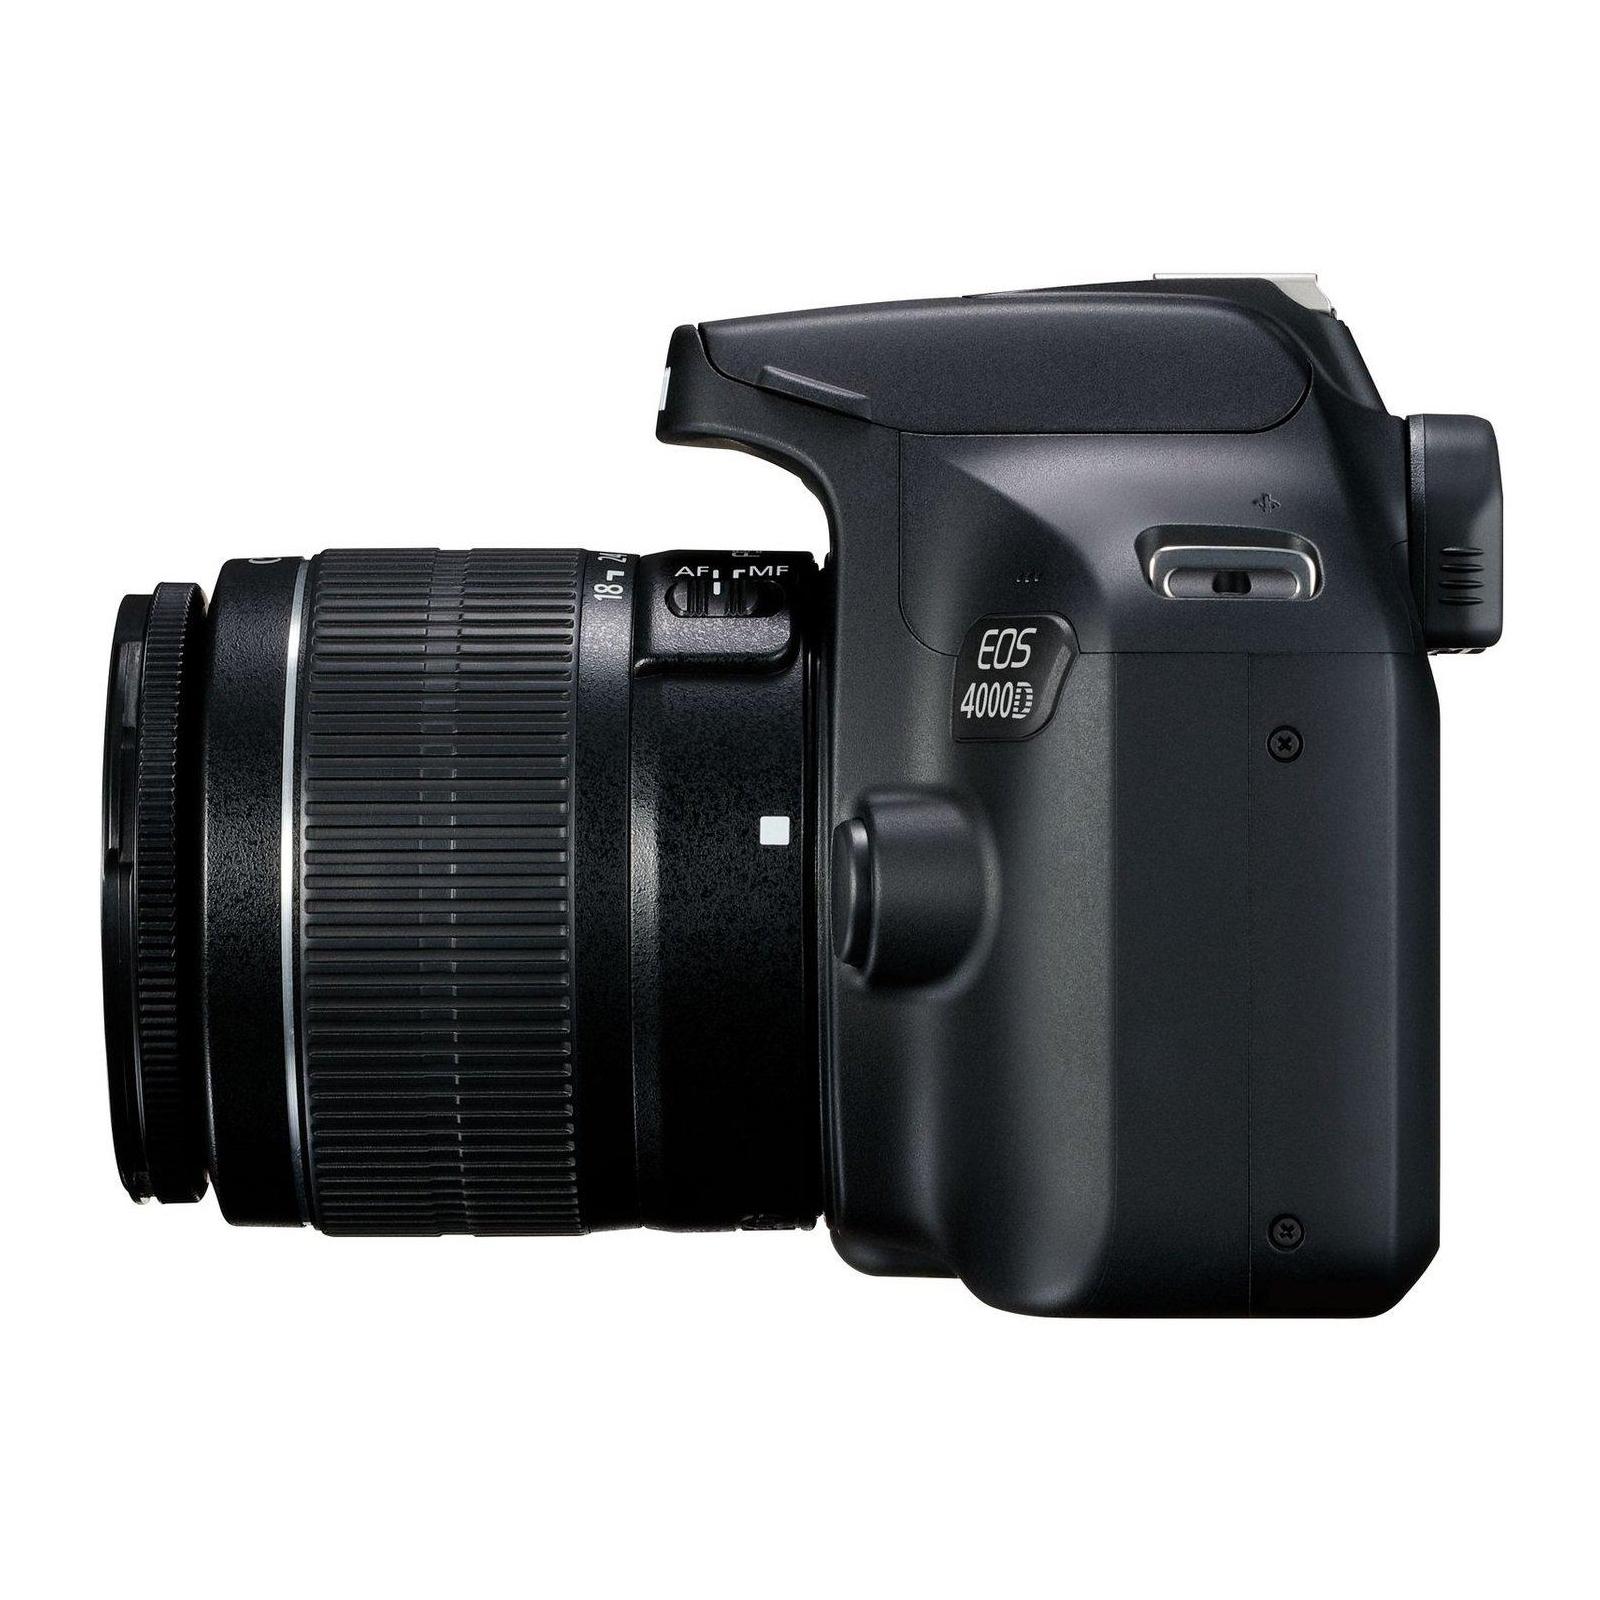 Цифровой фотоаппарат Canon EOS 4000D 18-55 DC III kit (3011C004) изображение 5